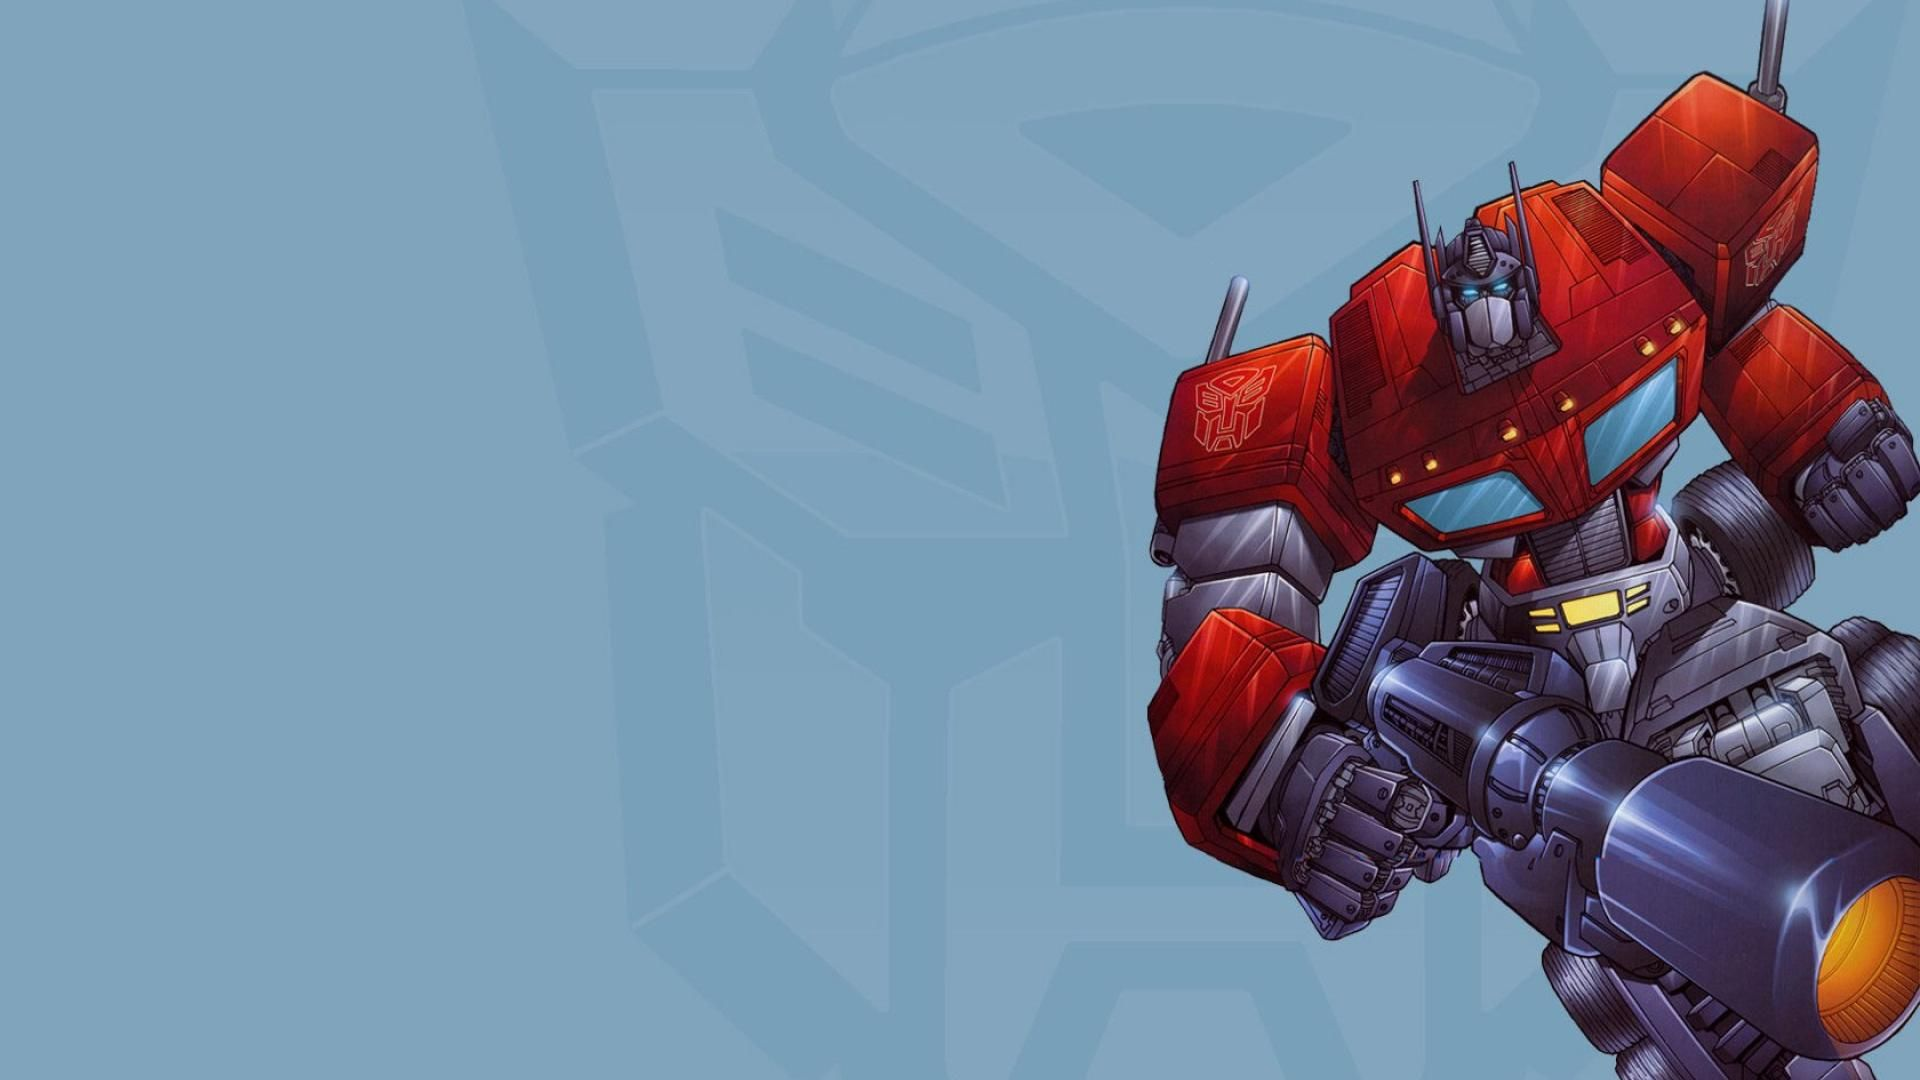 Transformers Cartoon Wallpaper Simplexpict1storg